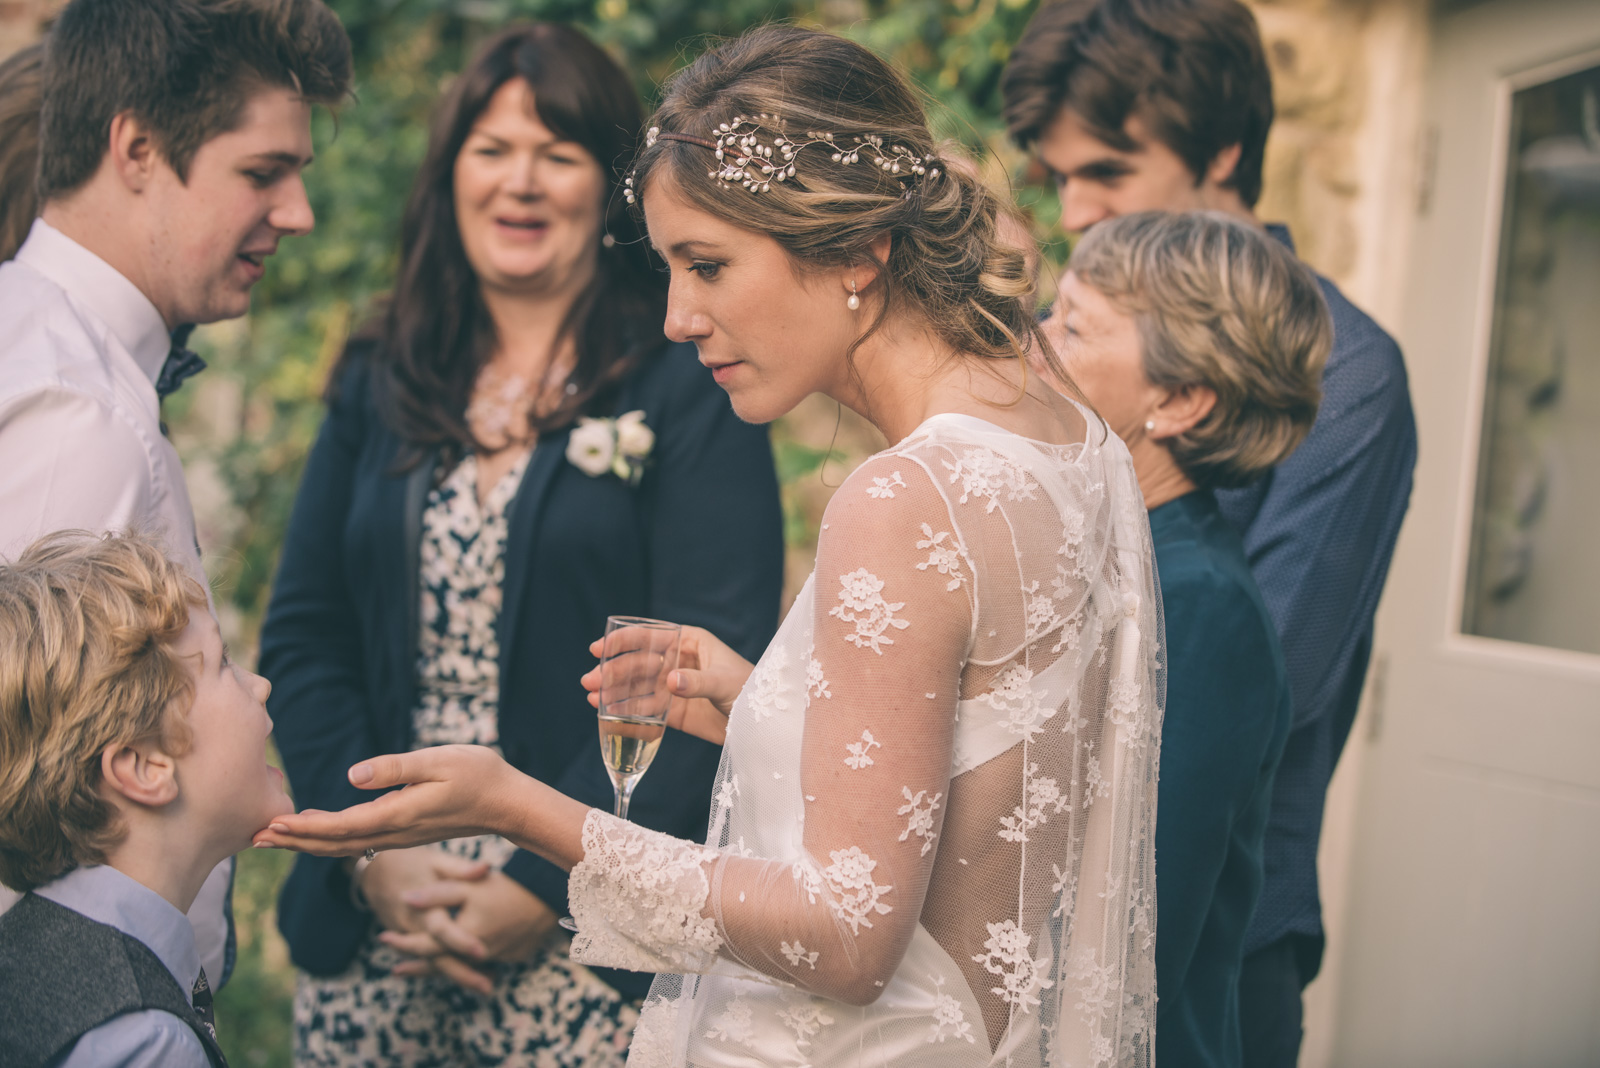 nancarrow-wedding-photography-107.jpg